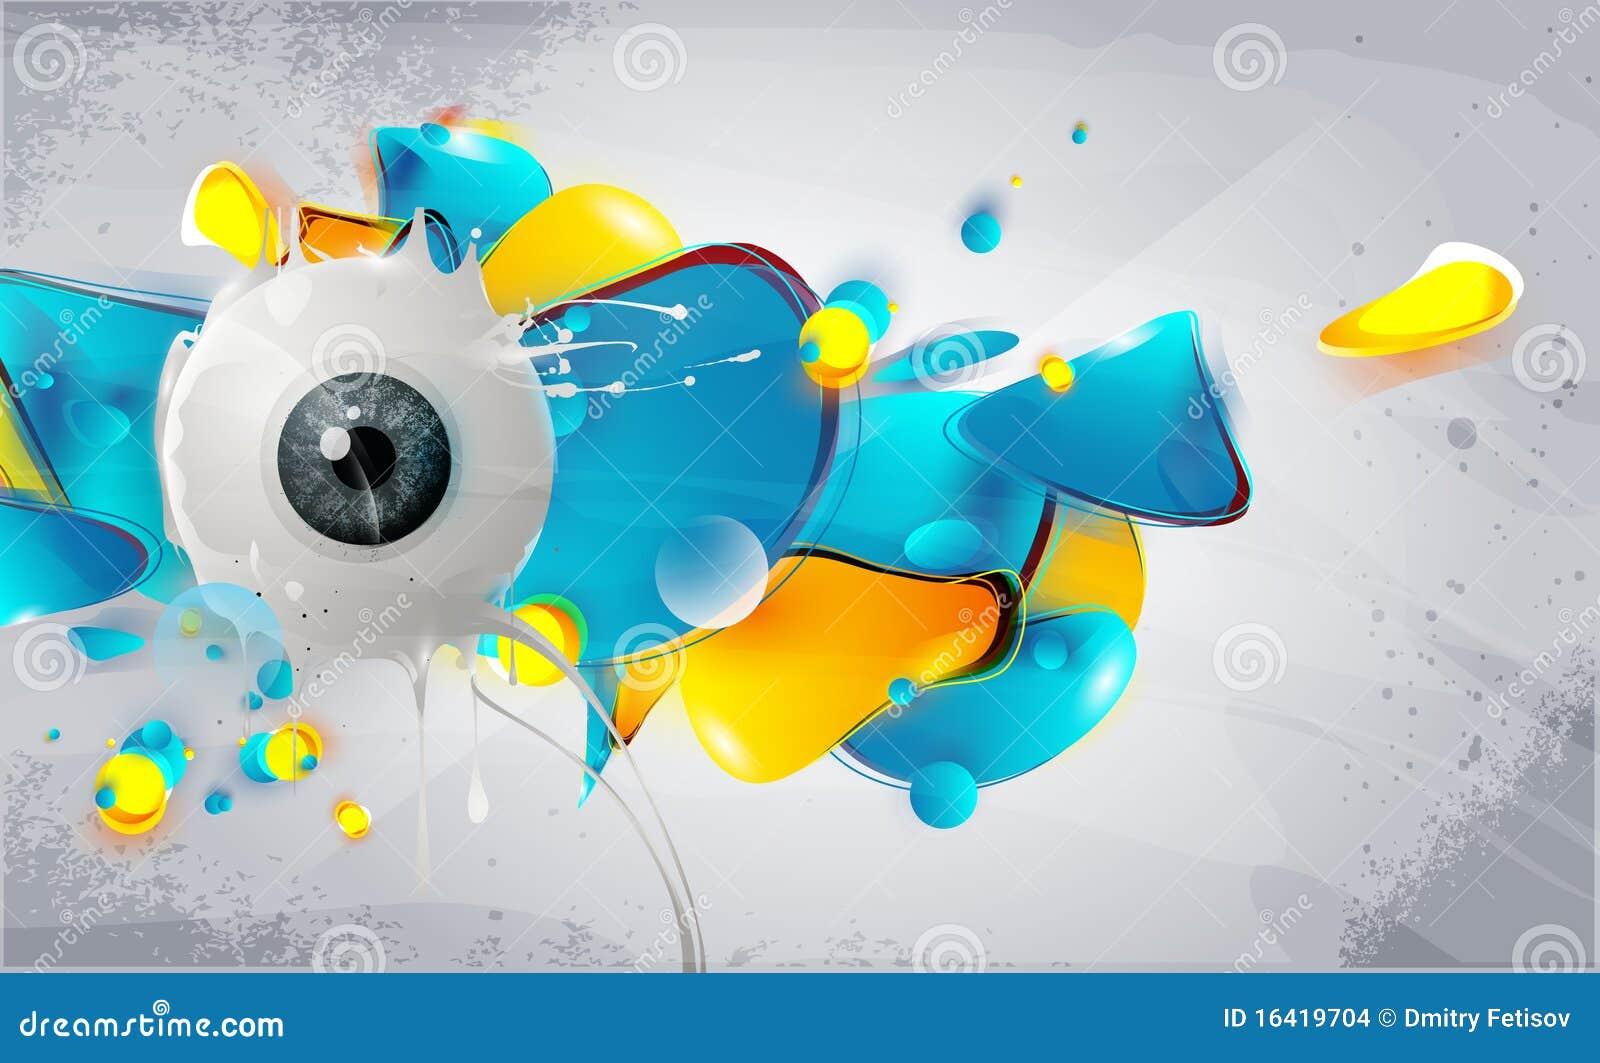 Abstrakt element eye humanen